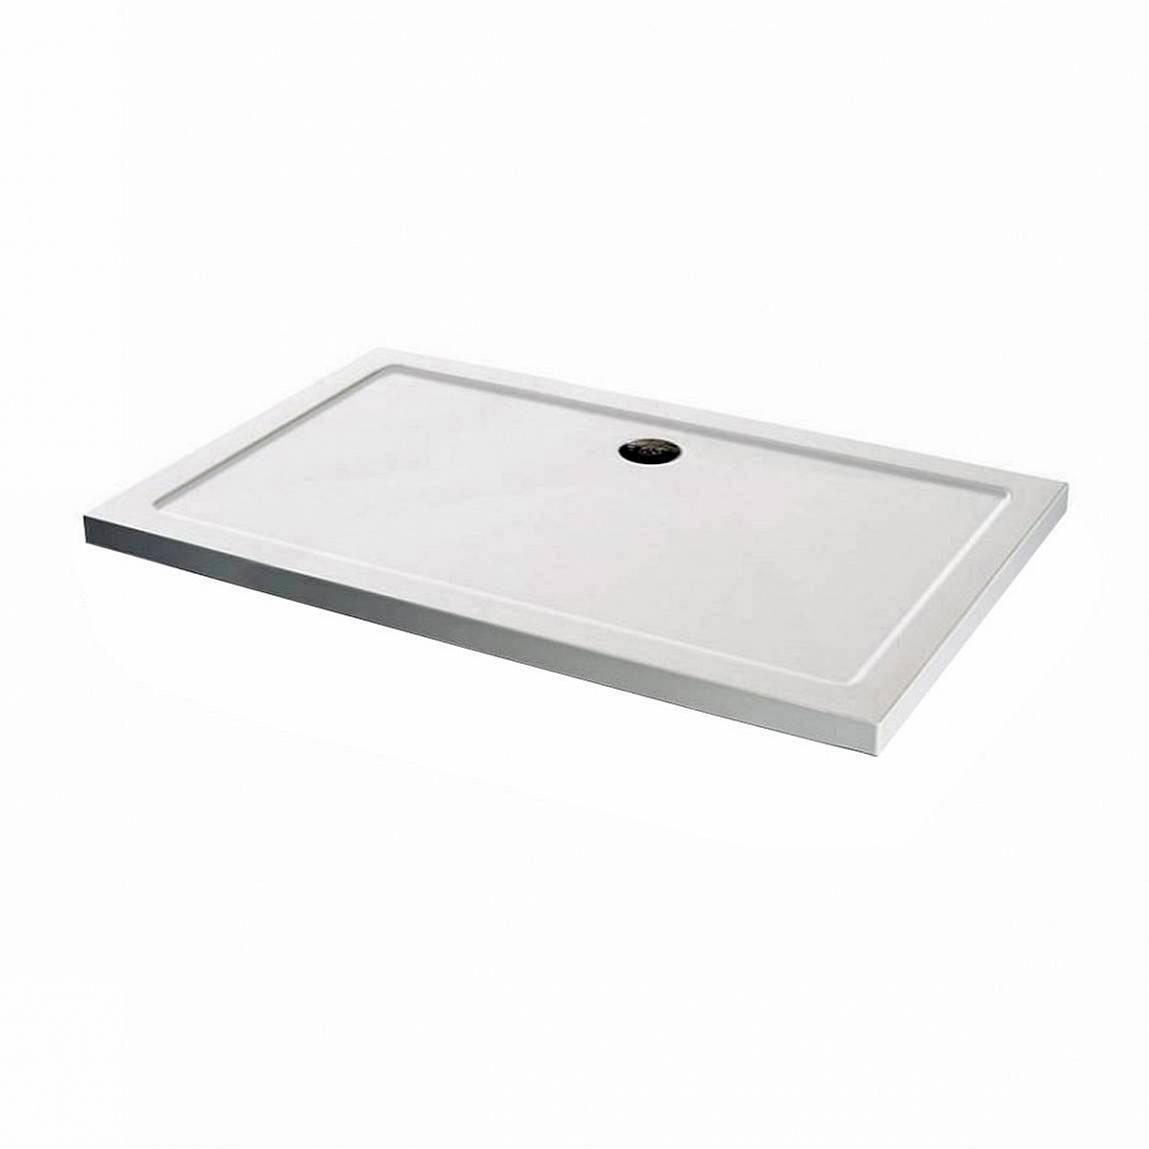 Image of Rectangular Stone Shower Tray 900 x 760